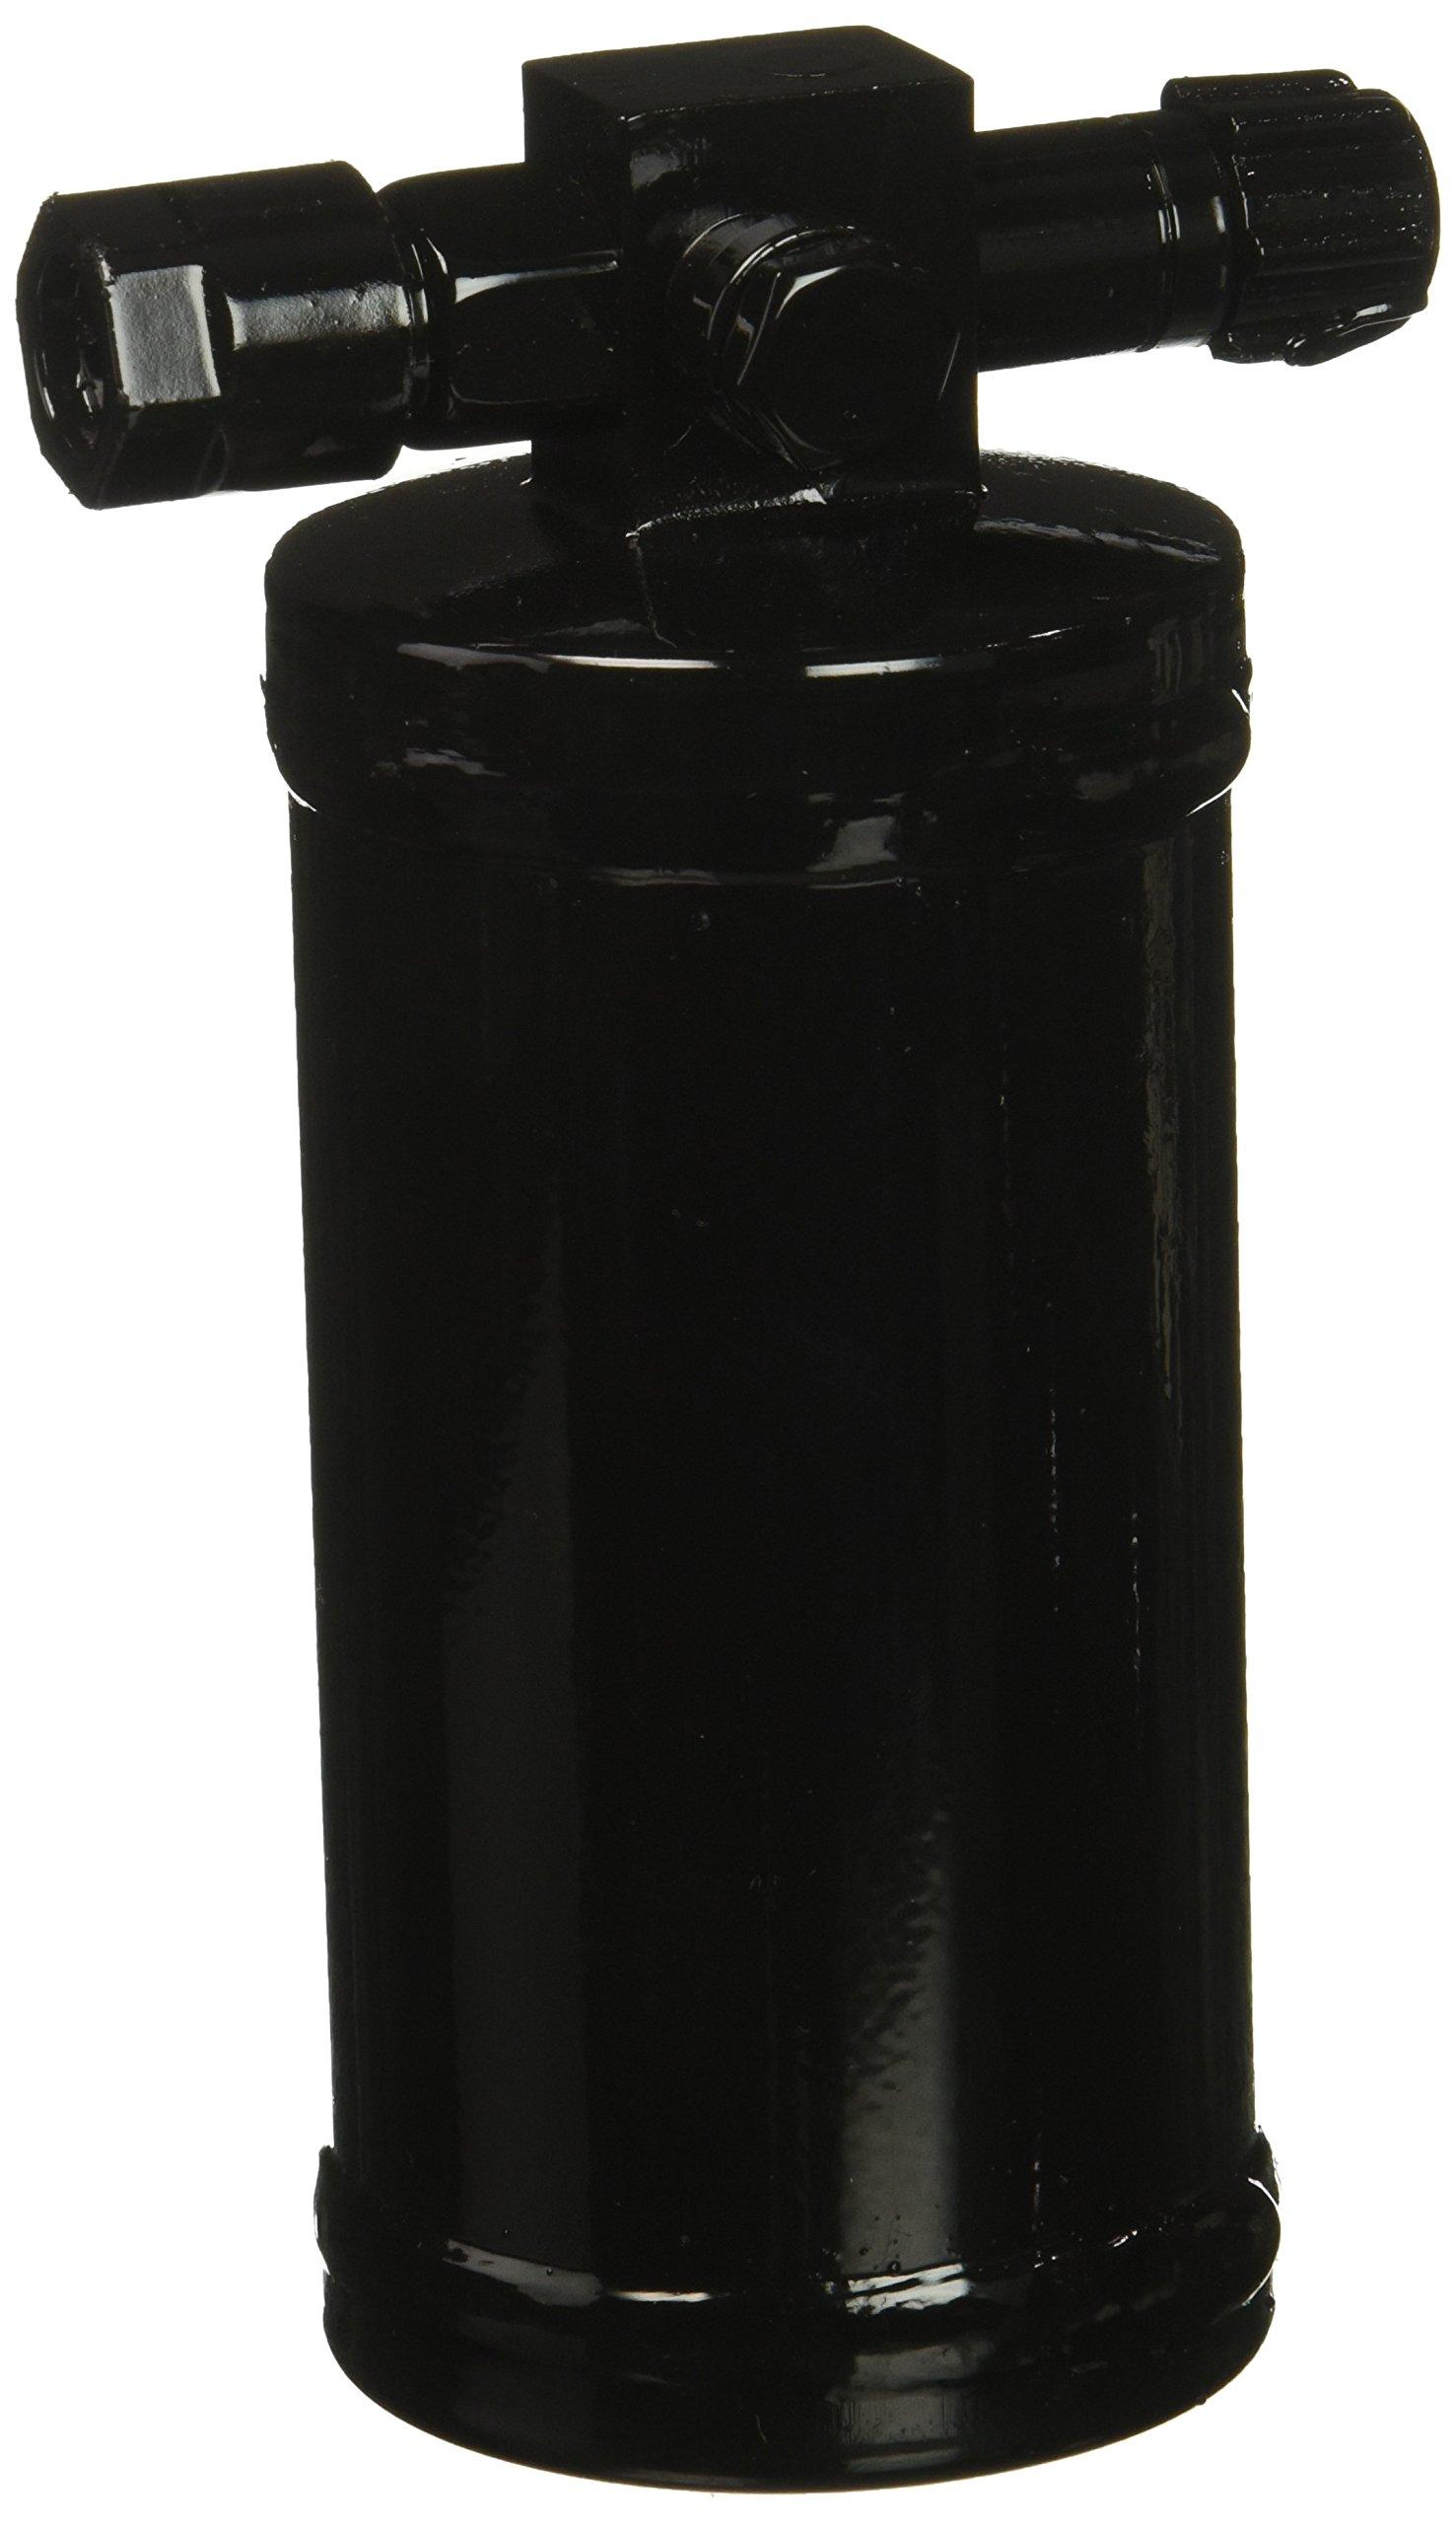 UAC RD 9970C ACCUMULATORS/DRIER, 99 Pack by UAC